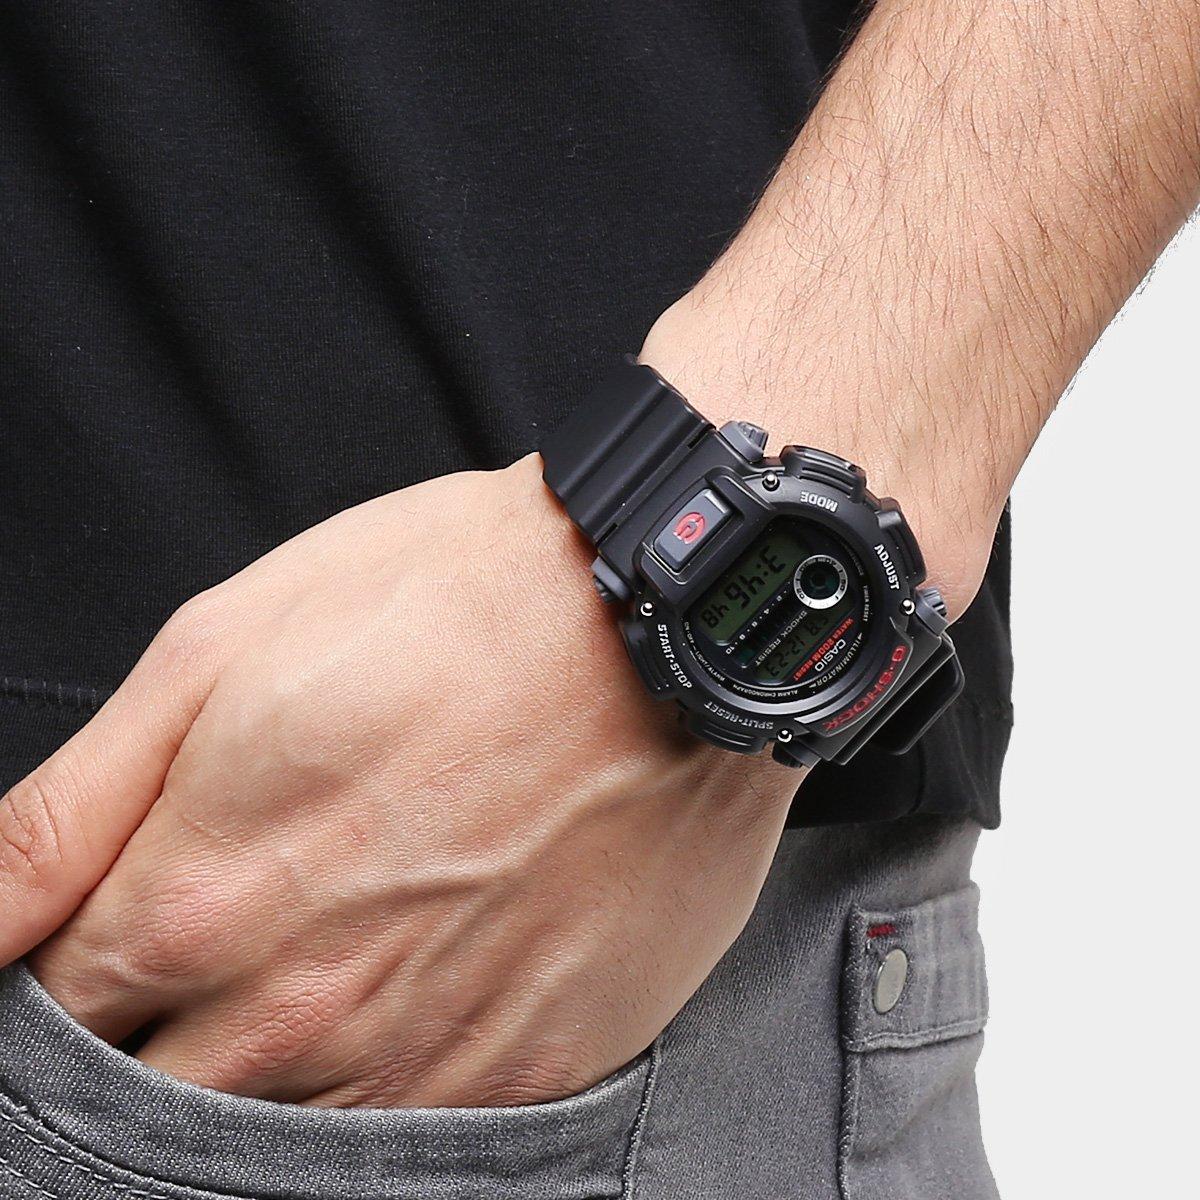 Relgio Casio G Shock Digital Dw 9052 Compre Agora Netshoes 1vdr